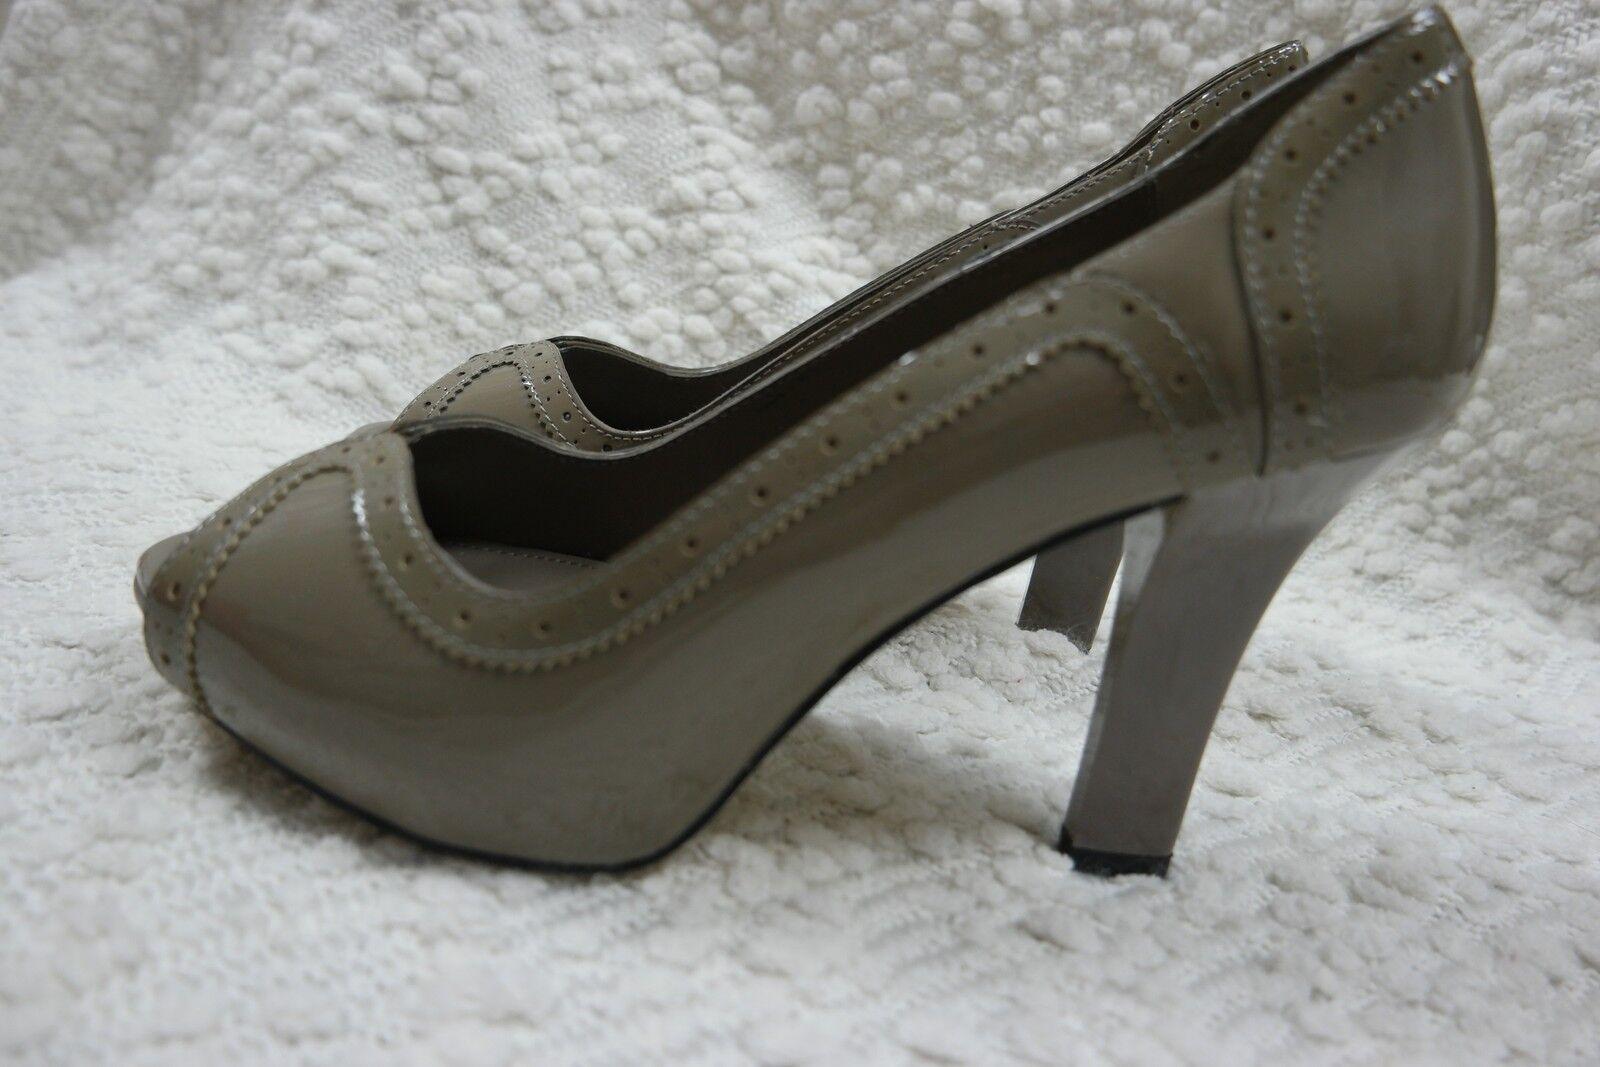 DIANA FERRARI sable Braun 100% patent Leder peep toe high heels Größe 9.5 BNIB